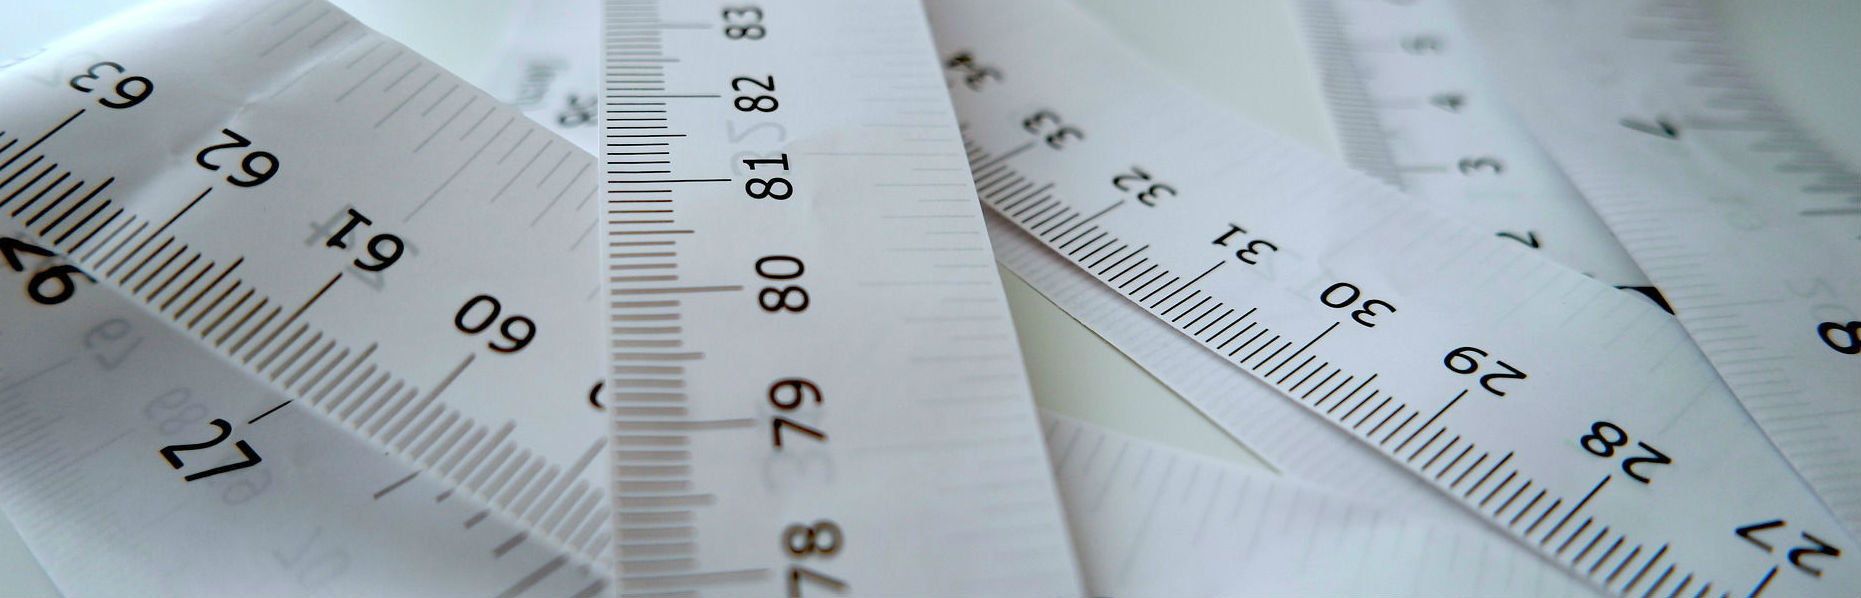 Measuring open data